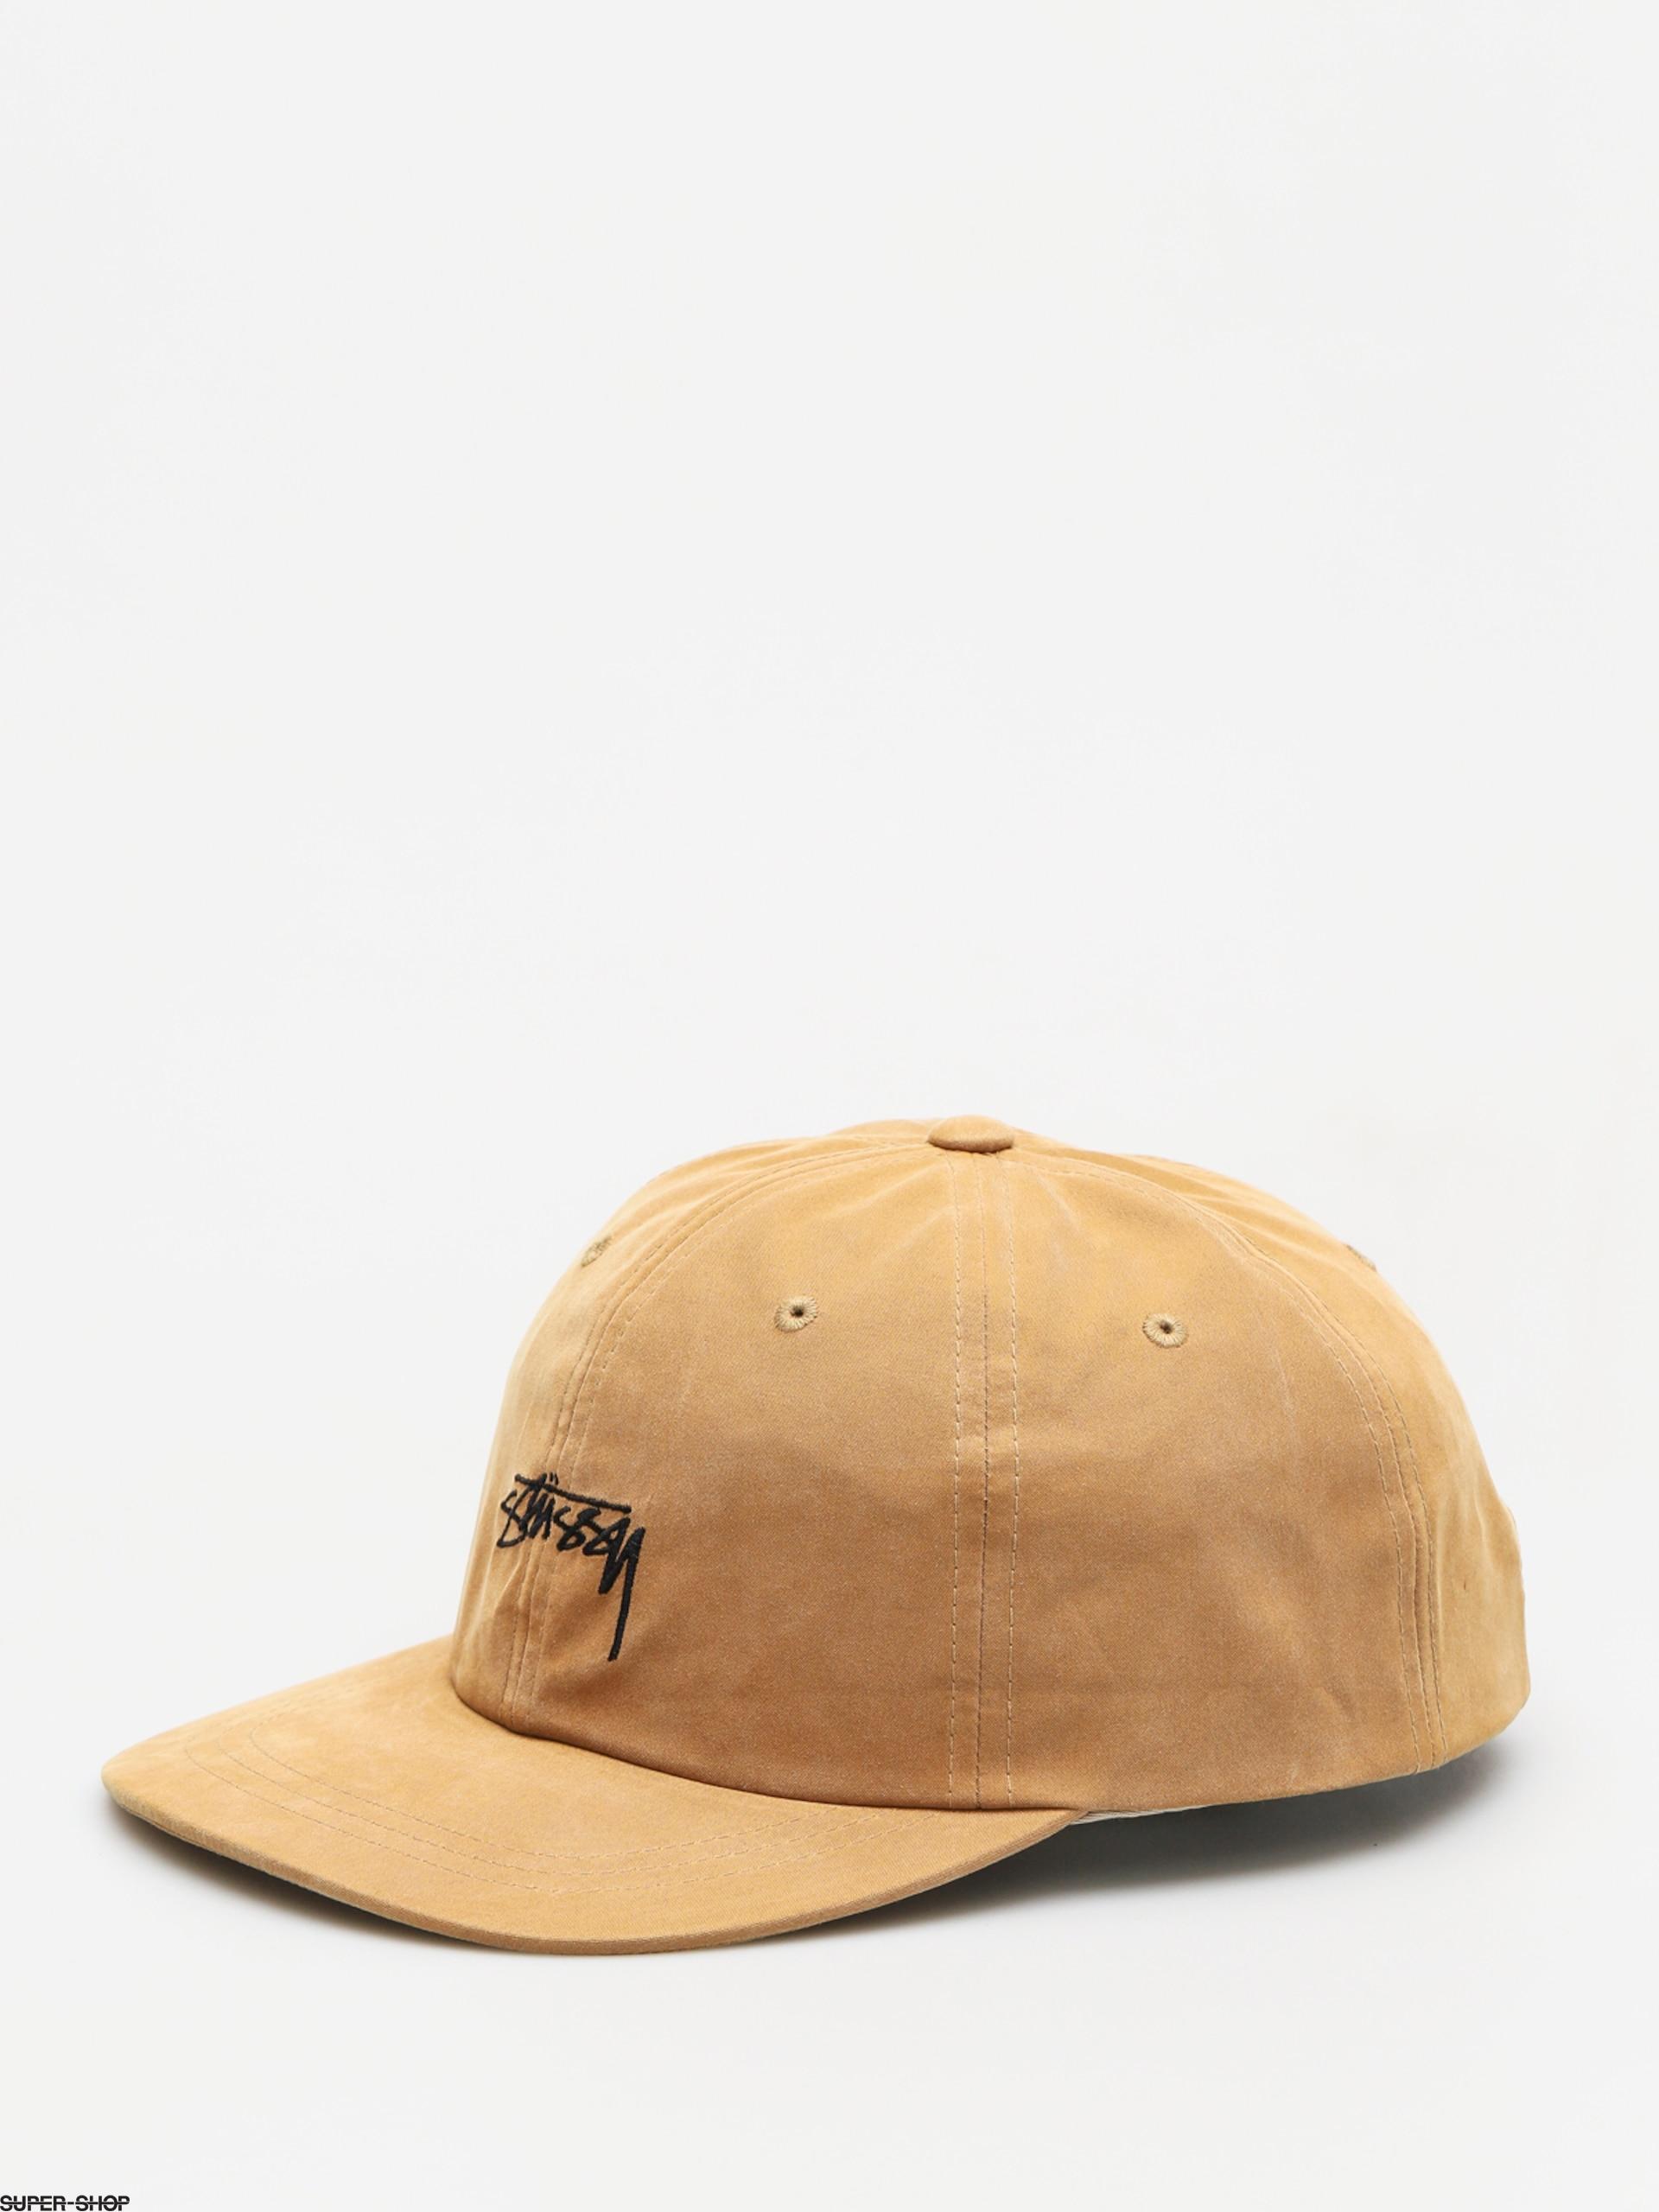 973091-w1920-stussy-cap-peached-smooth-stock-low-pro-camel.jpg 7c9c19bb369c